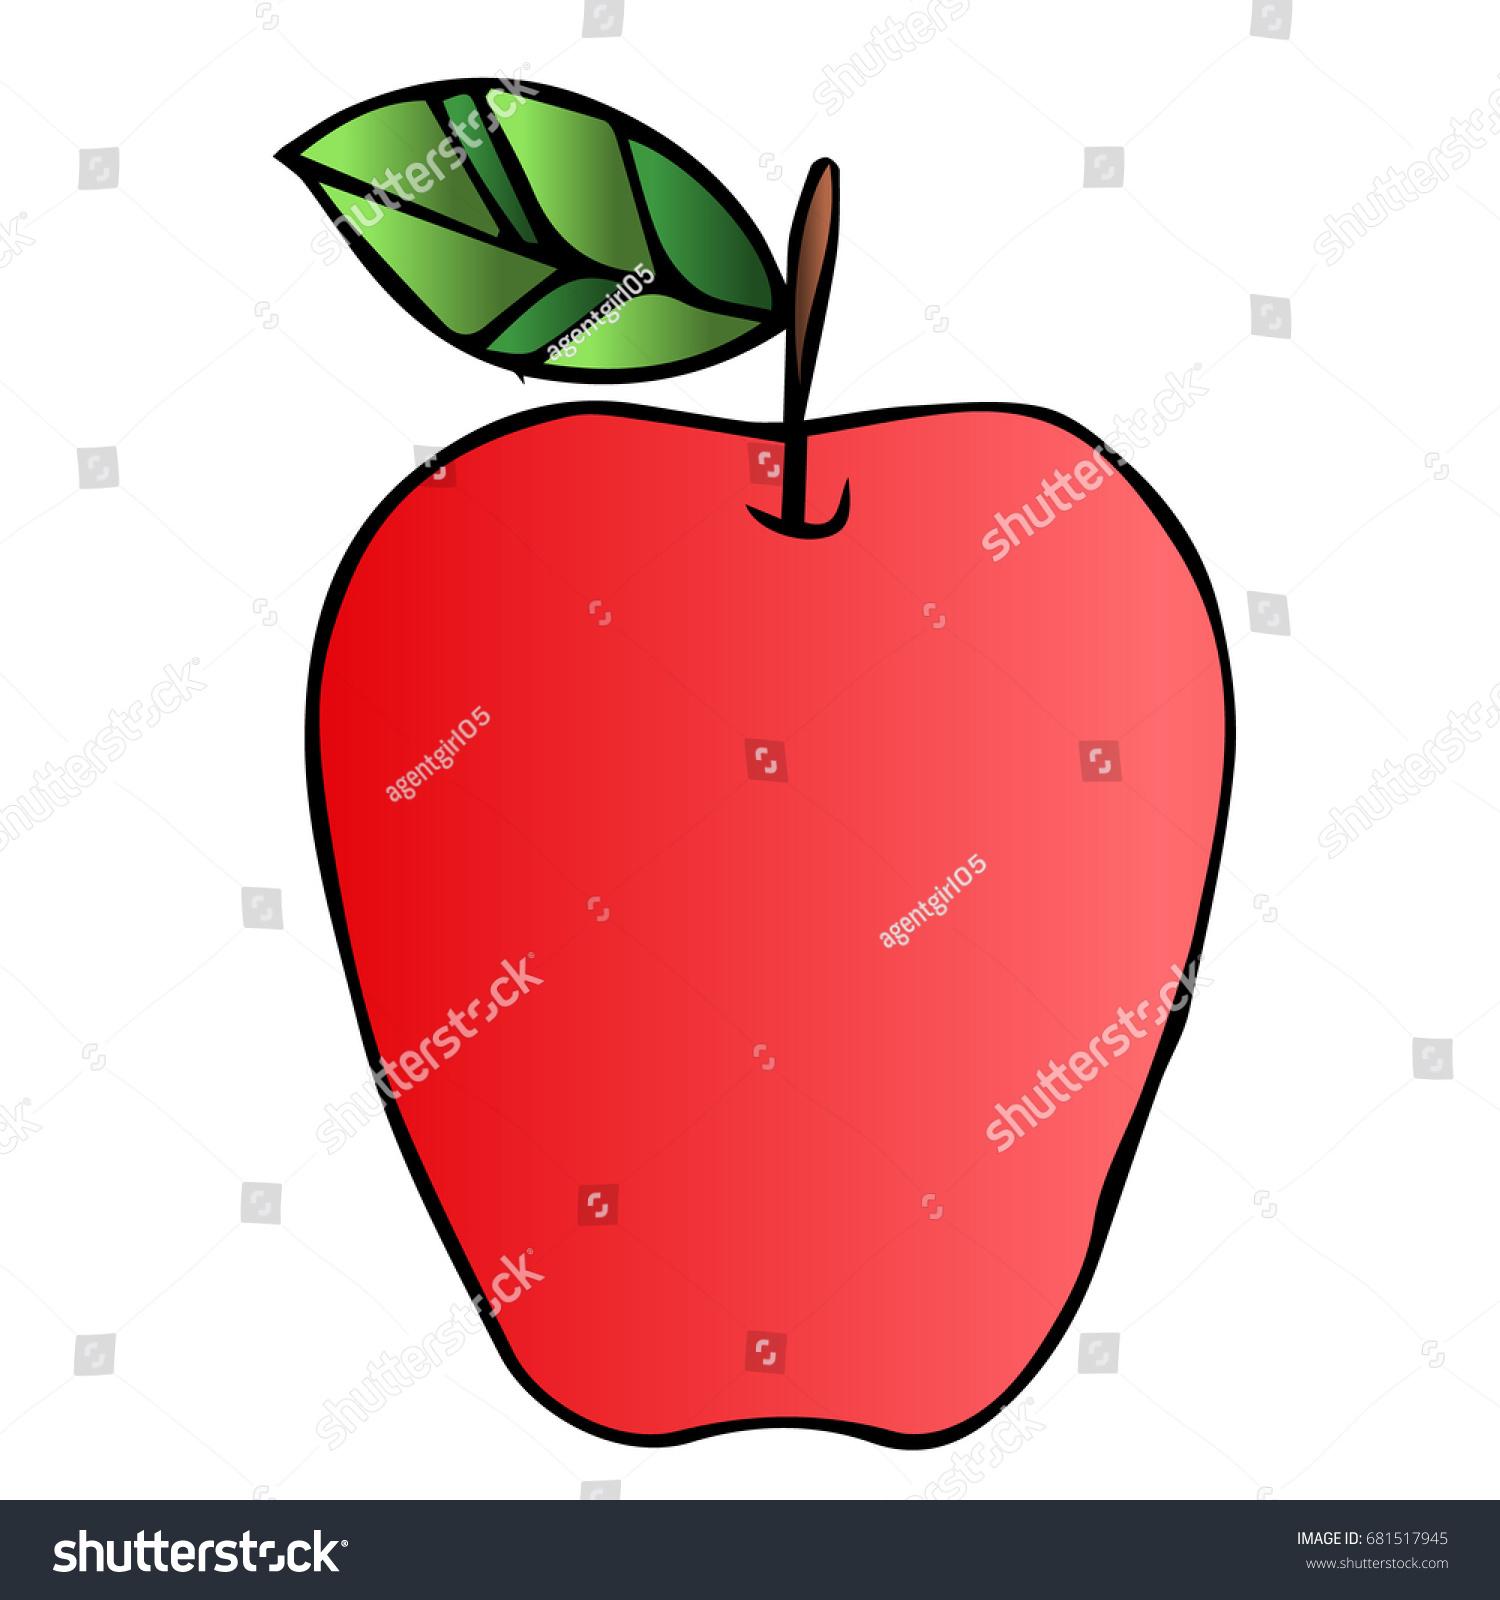 Apple stock market symbol choice image symbol and sign ideas apple vector illustration on white background stock vector apple vector illustration on white background apple icon buycottarizona